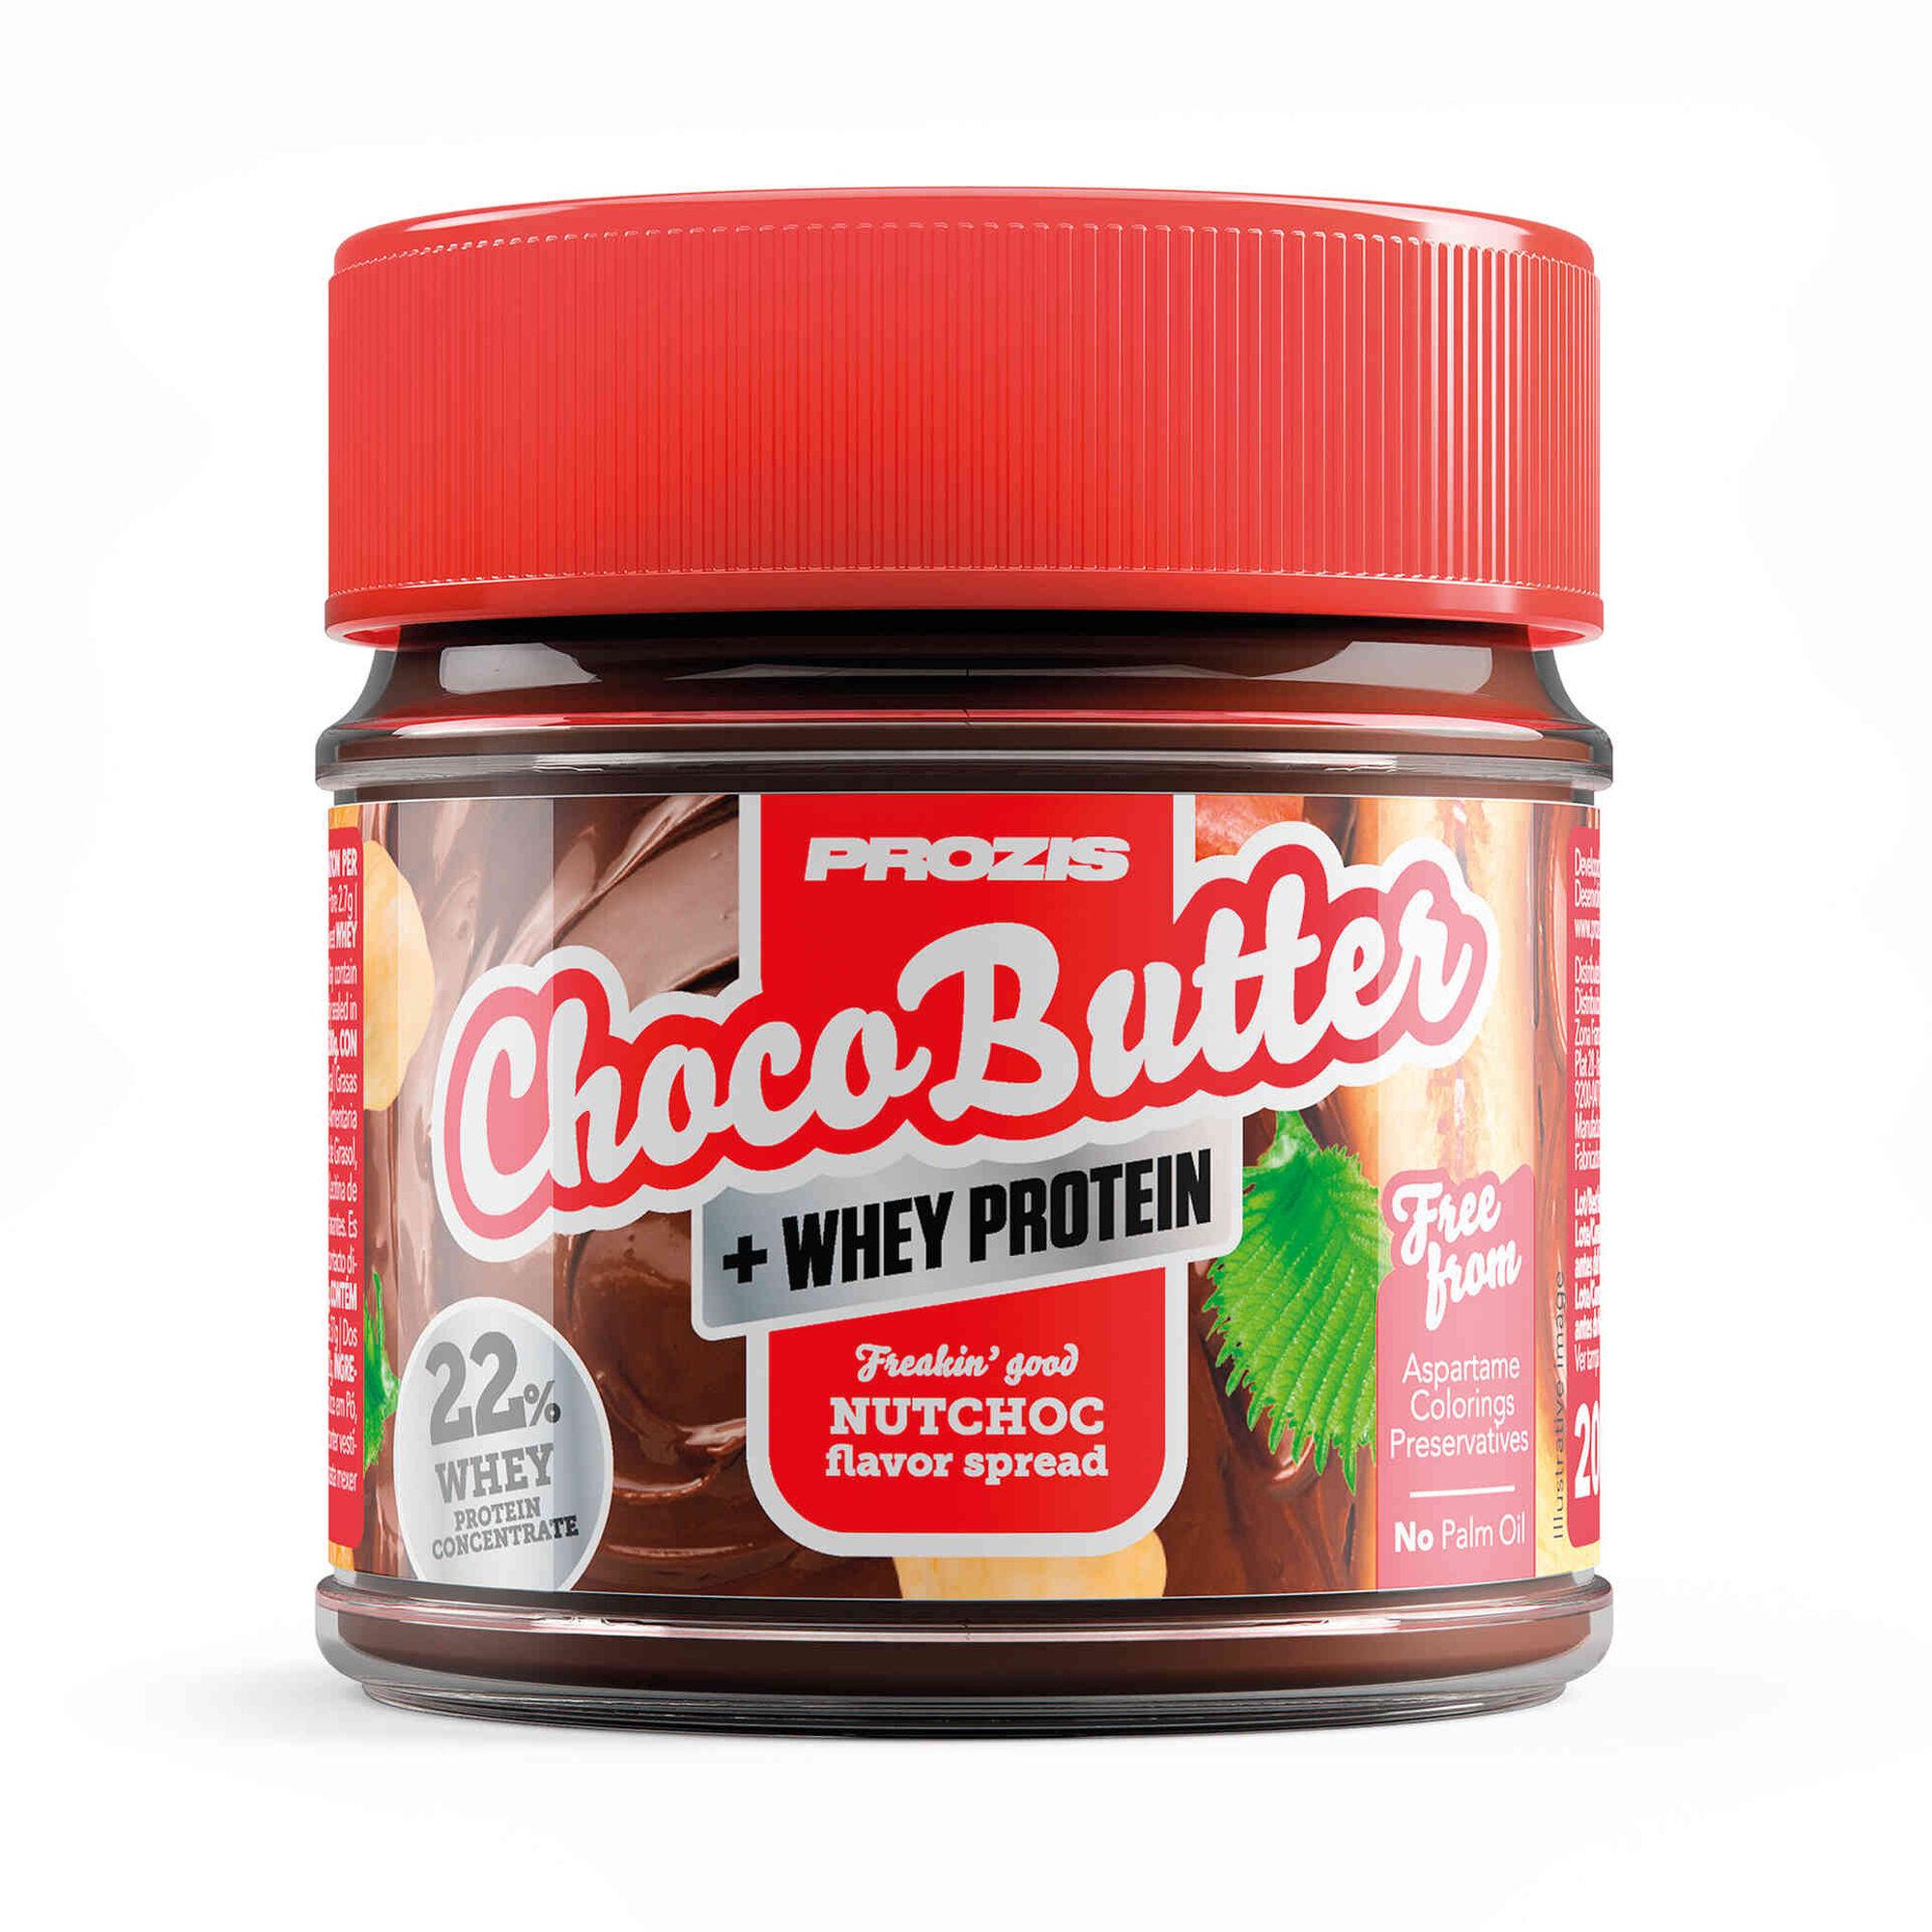 Whey Choco Butter